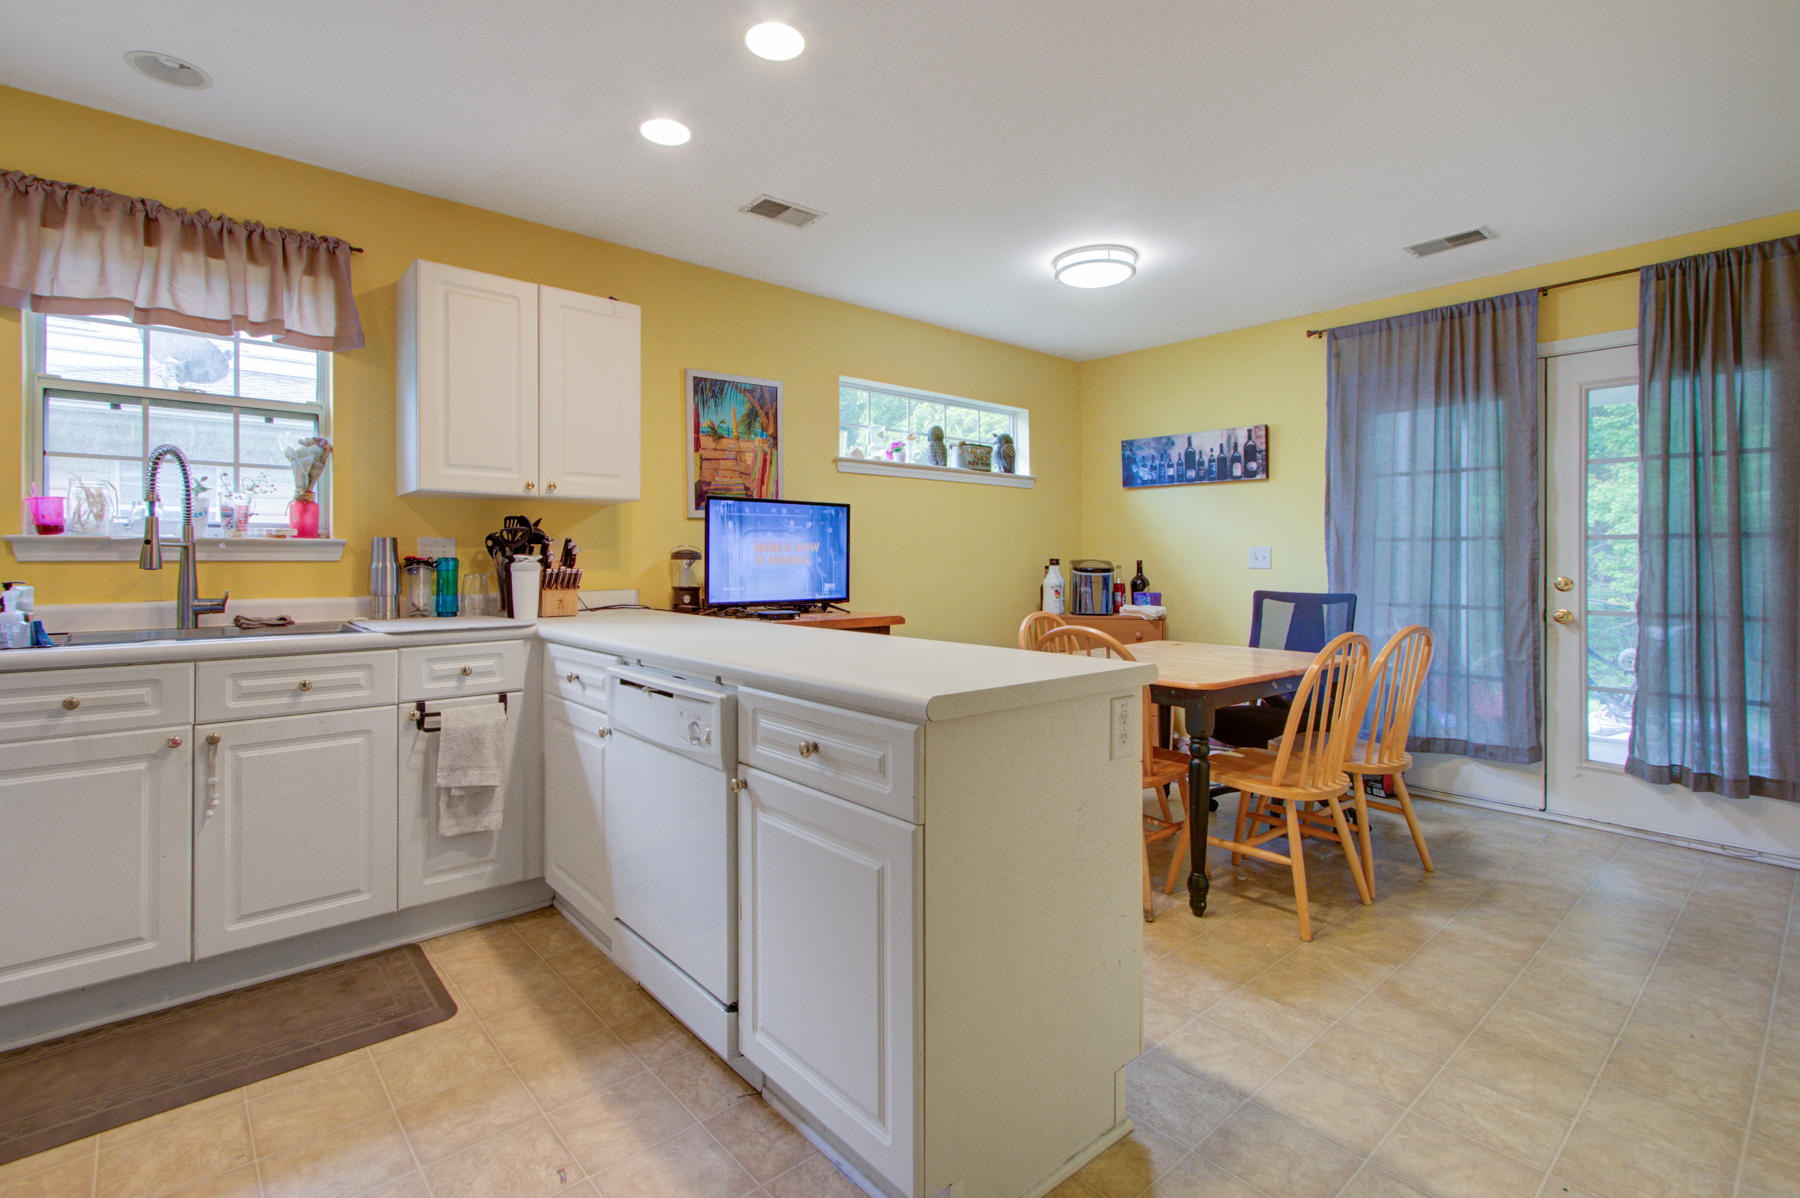 Dunes West Homes For Sale - 2232 Kings Gate, Mount Pleasant, SC - 31